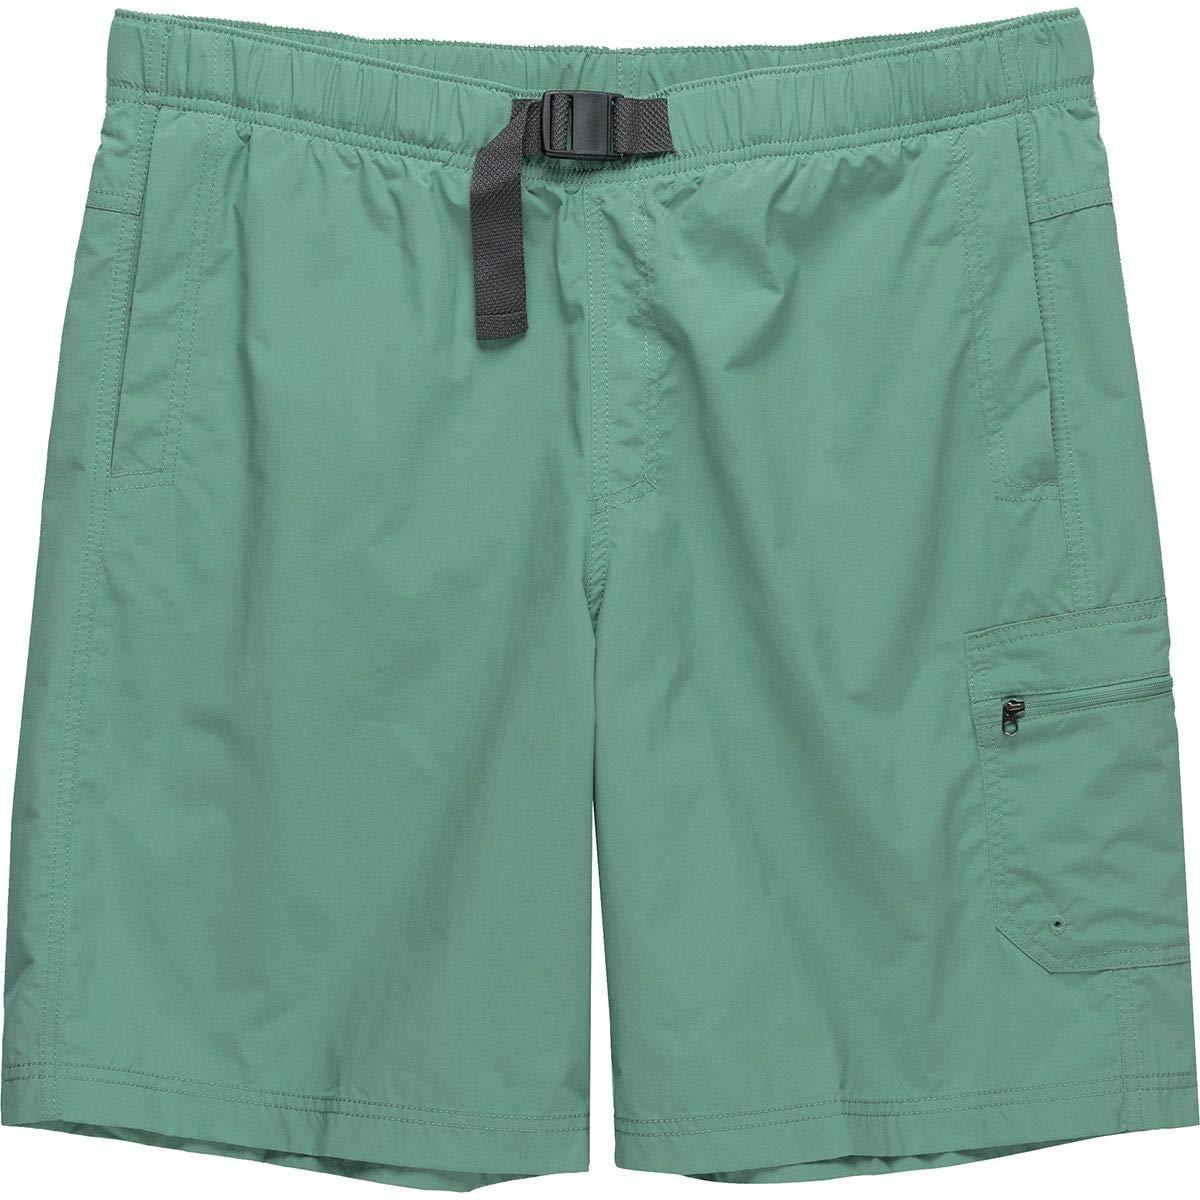 Columbia Men's Palmerston Peak Short, Waterproof, UV Sun Protection, Copper Ore, Small x 11'' Inseam by Columbia